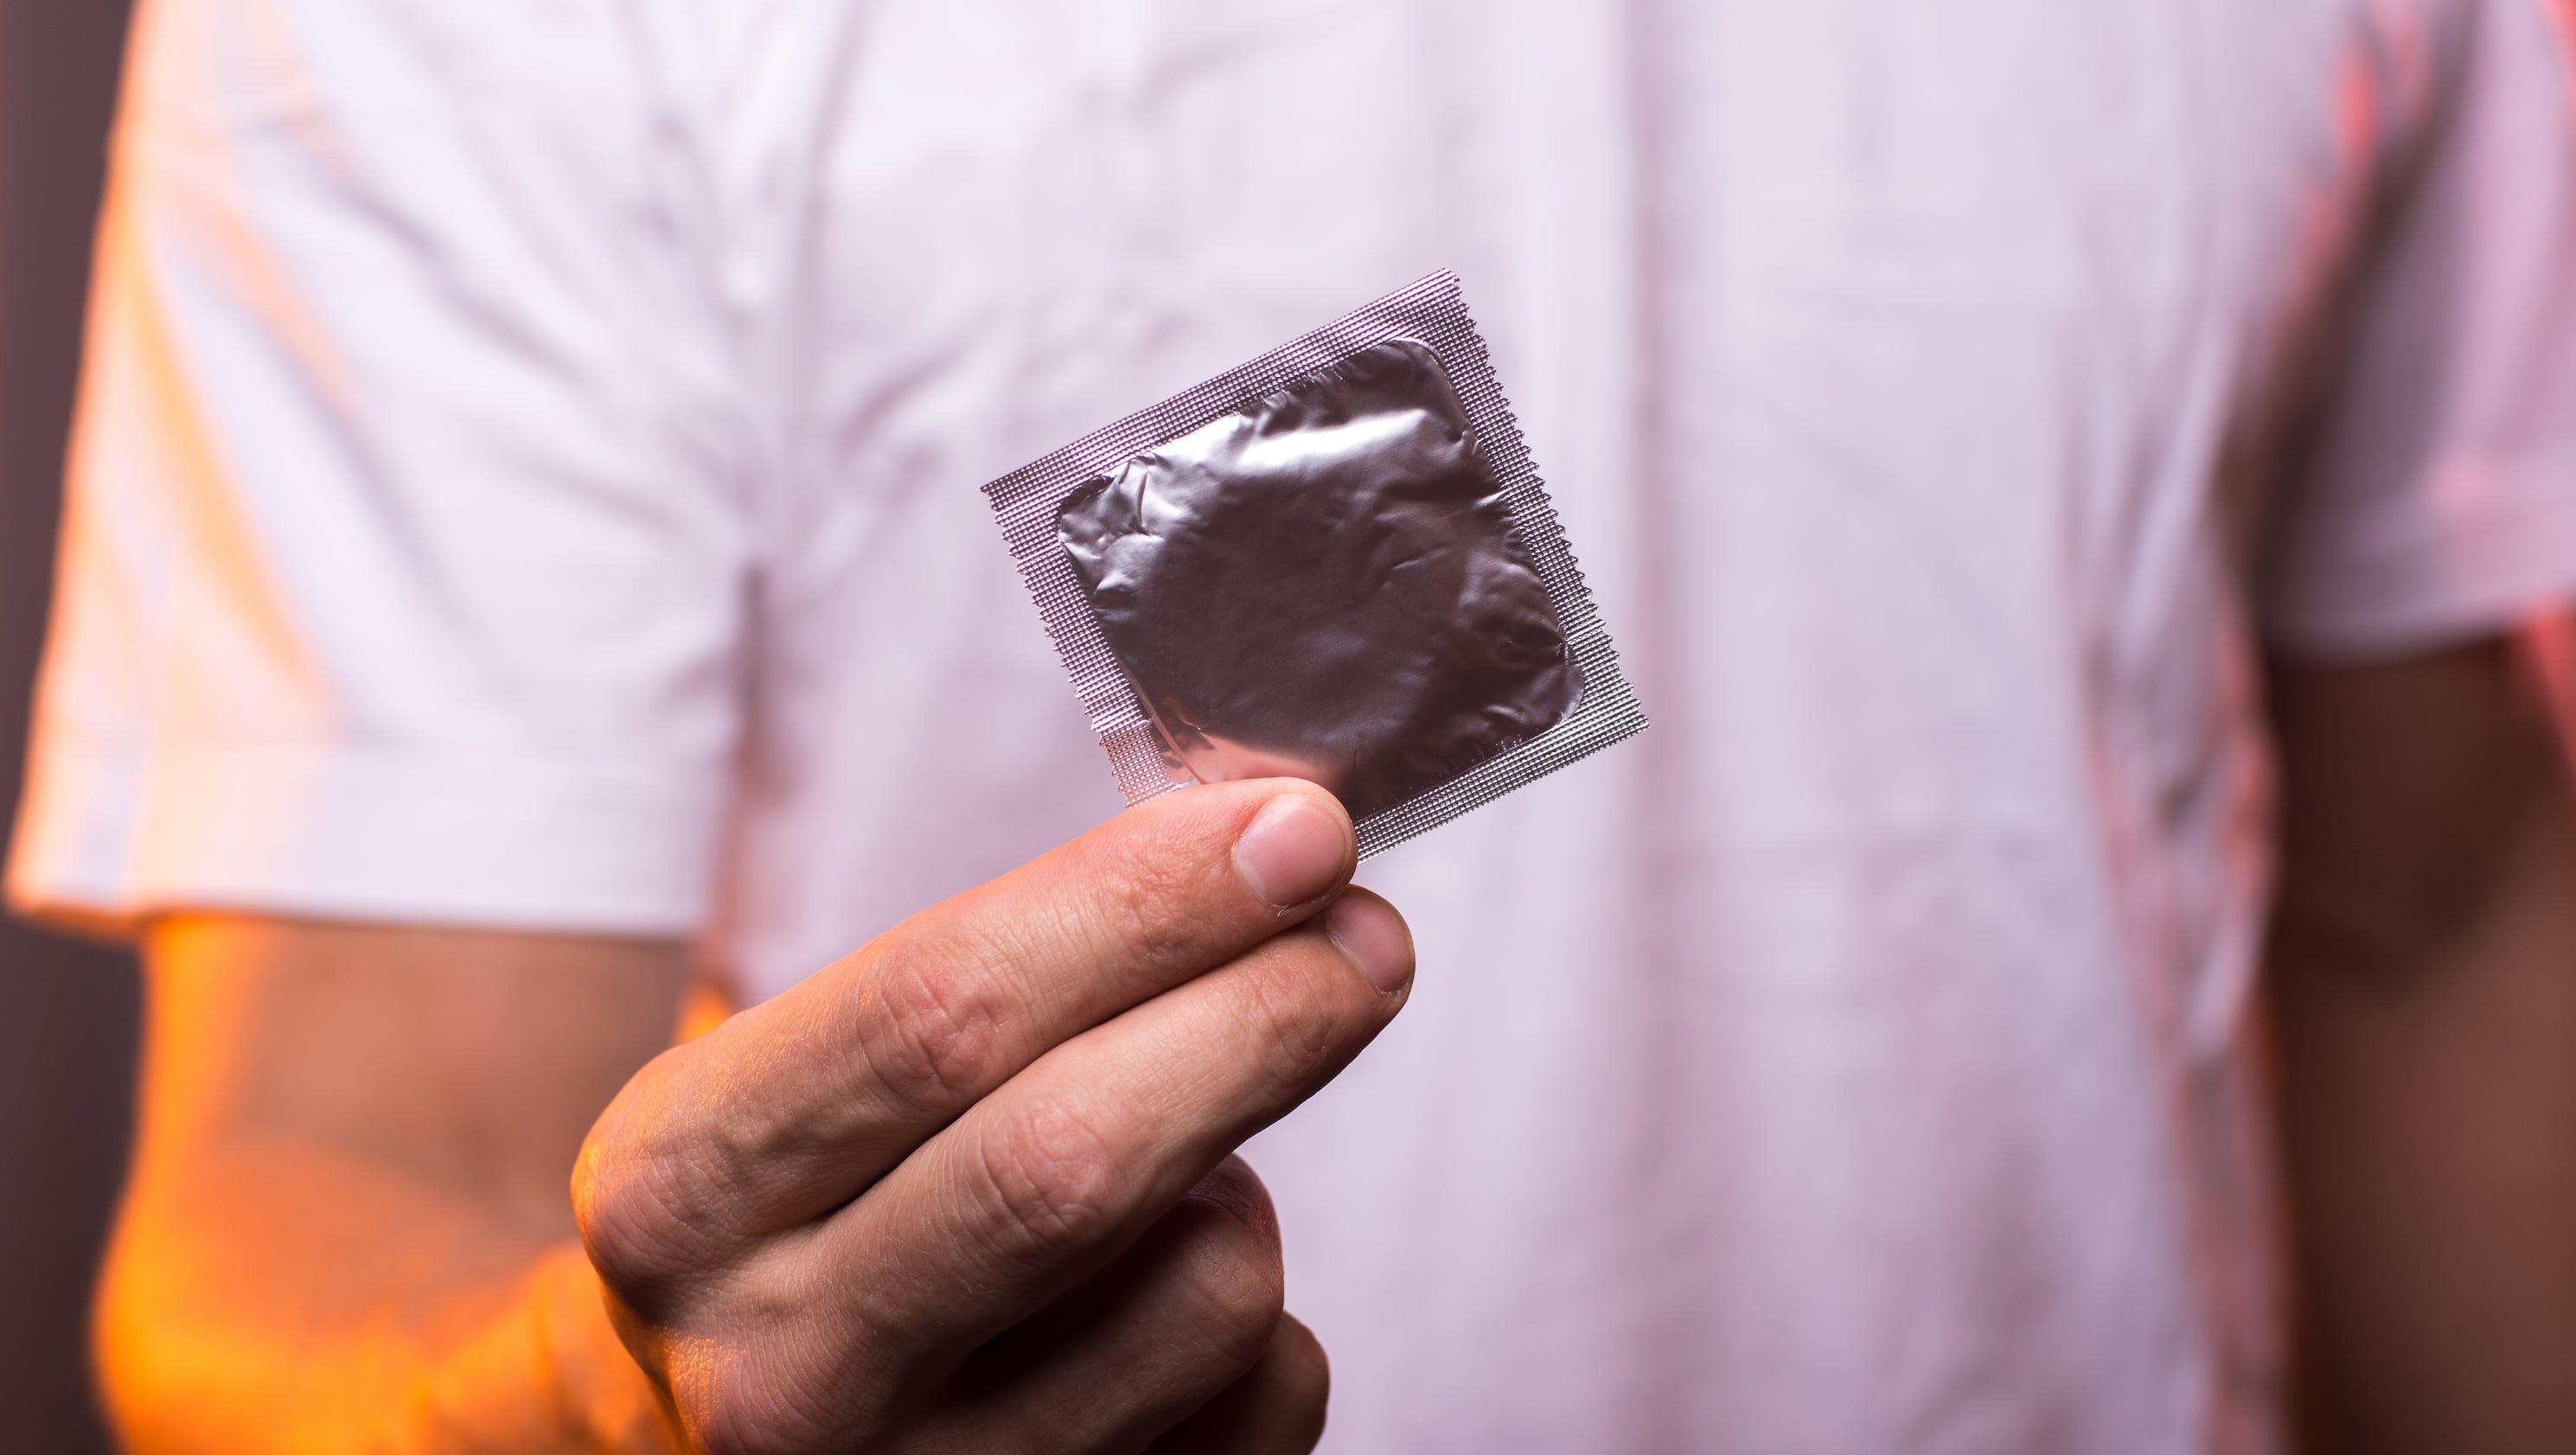 Condom snorting challenge alarms parents